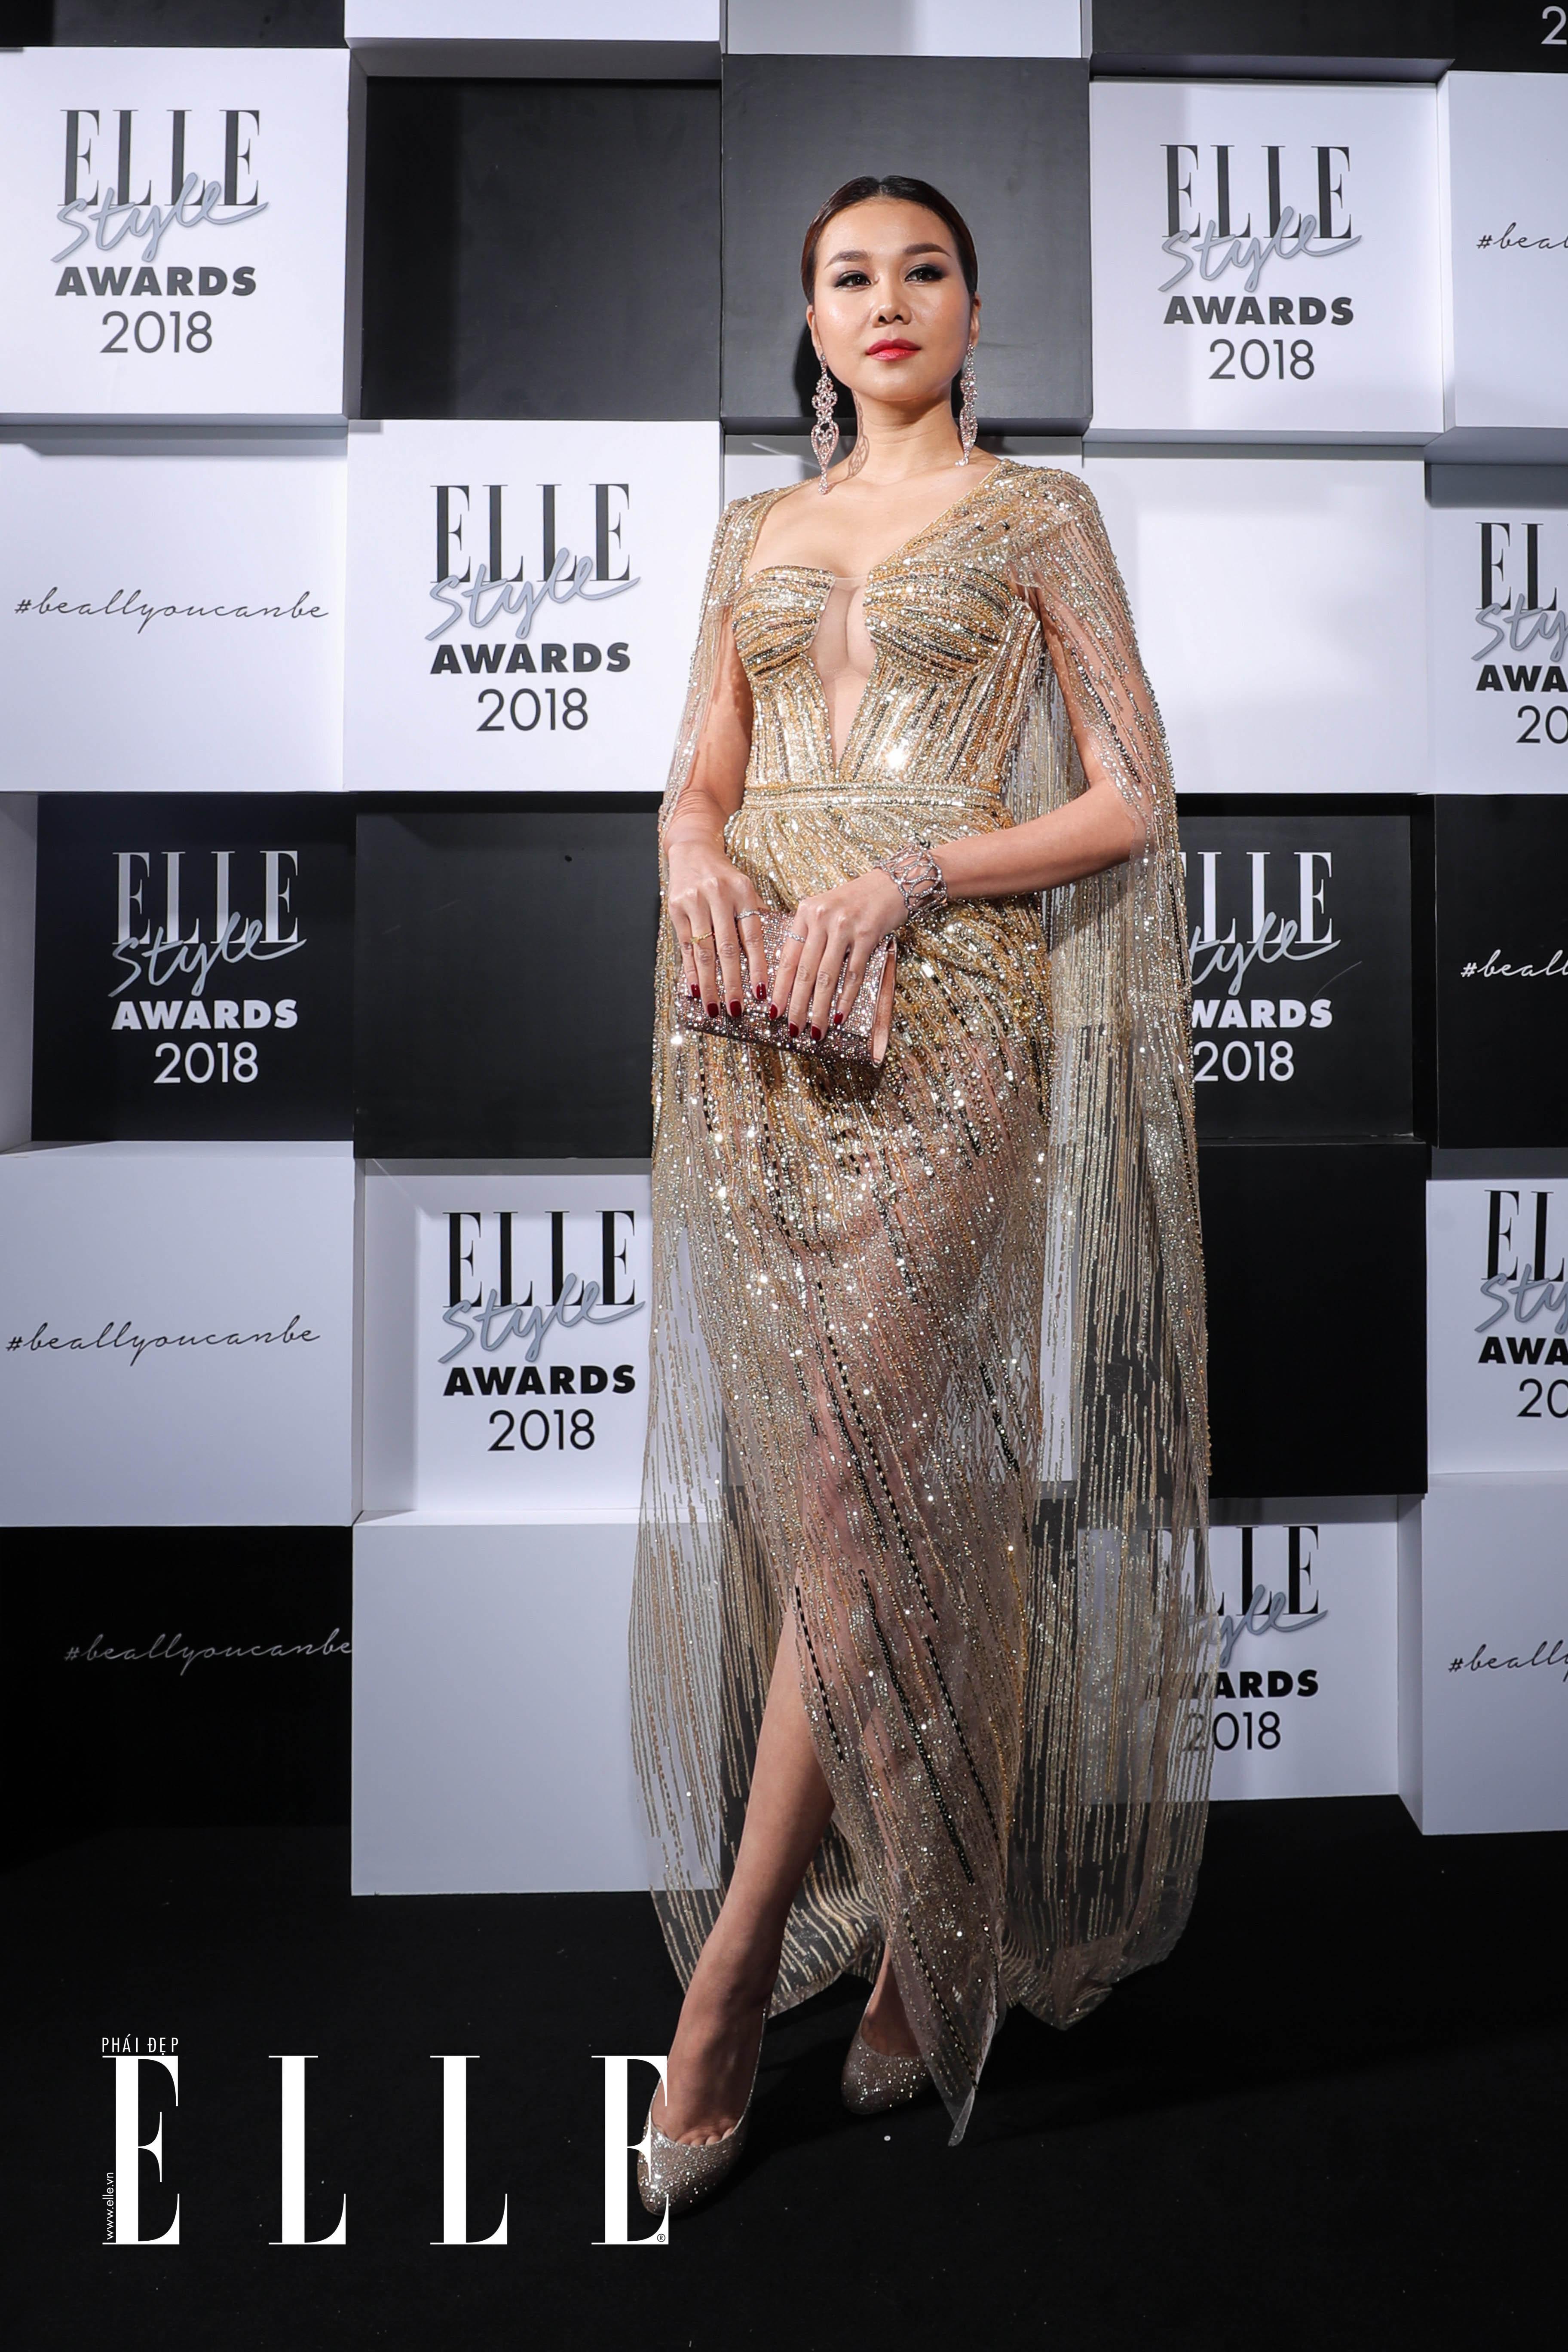 elle style awards best dress - elle man 34